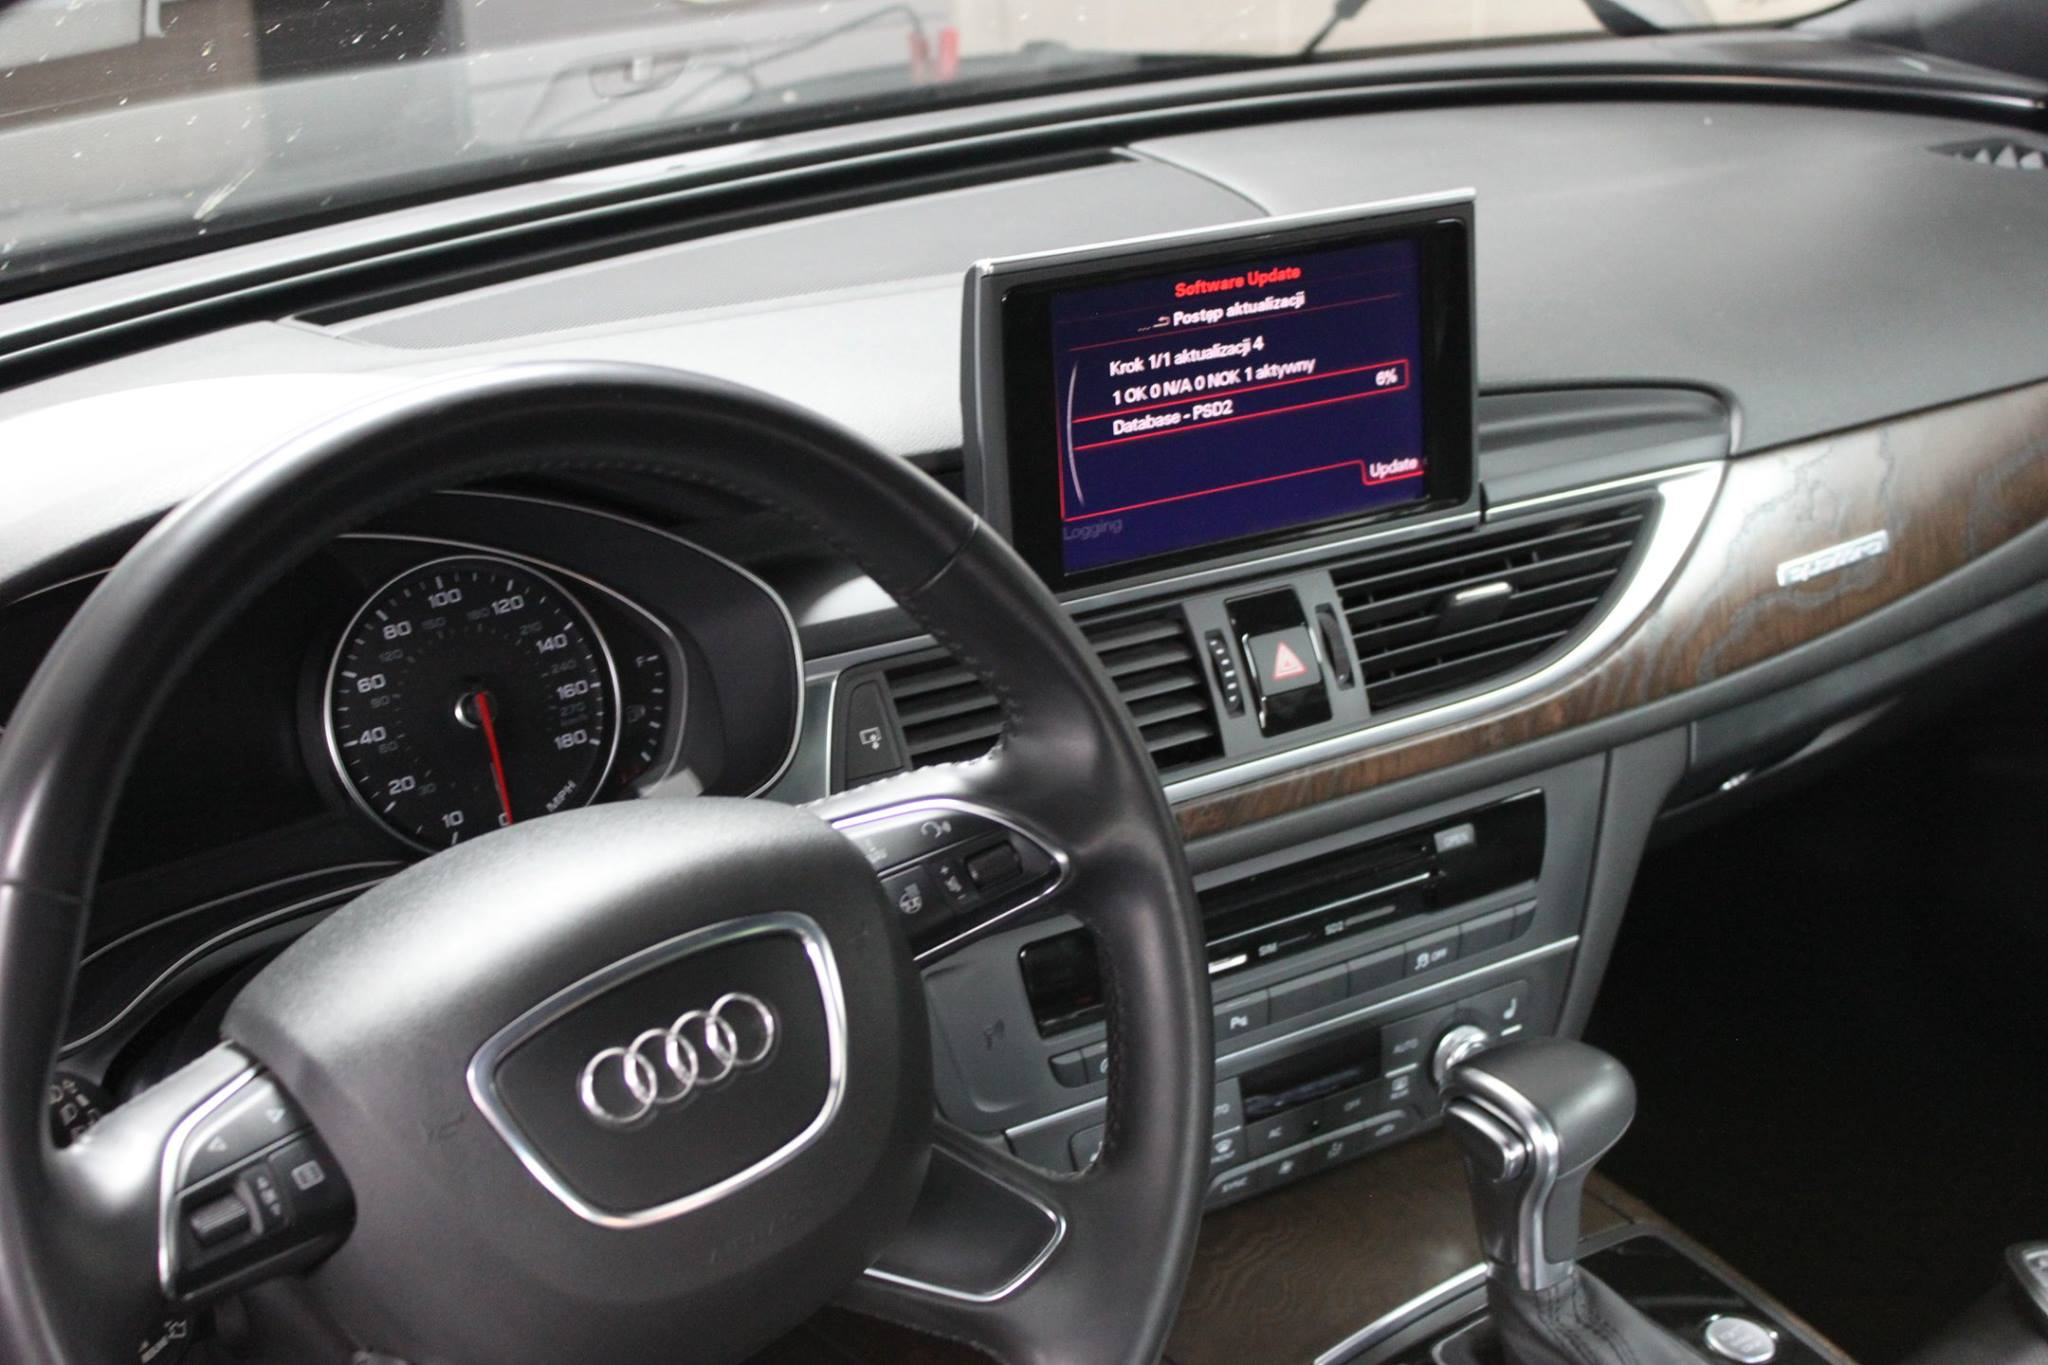 AUDI A6 C7 3.0 TFSI 440KM